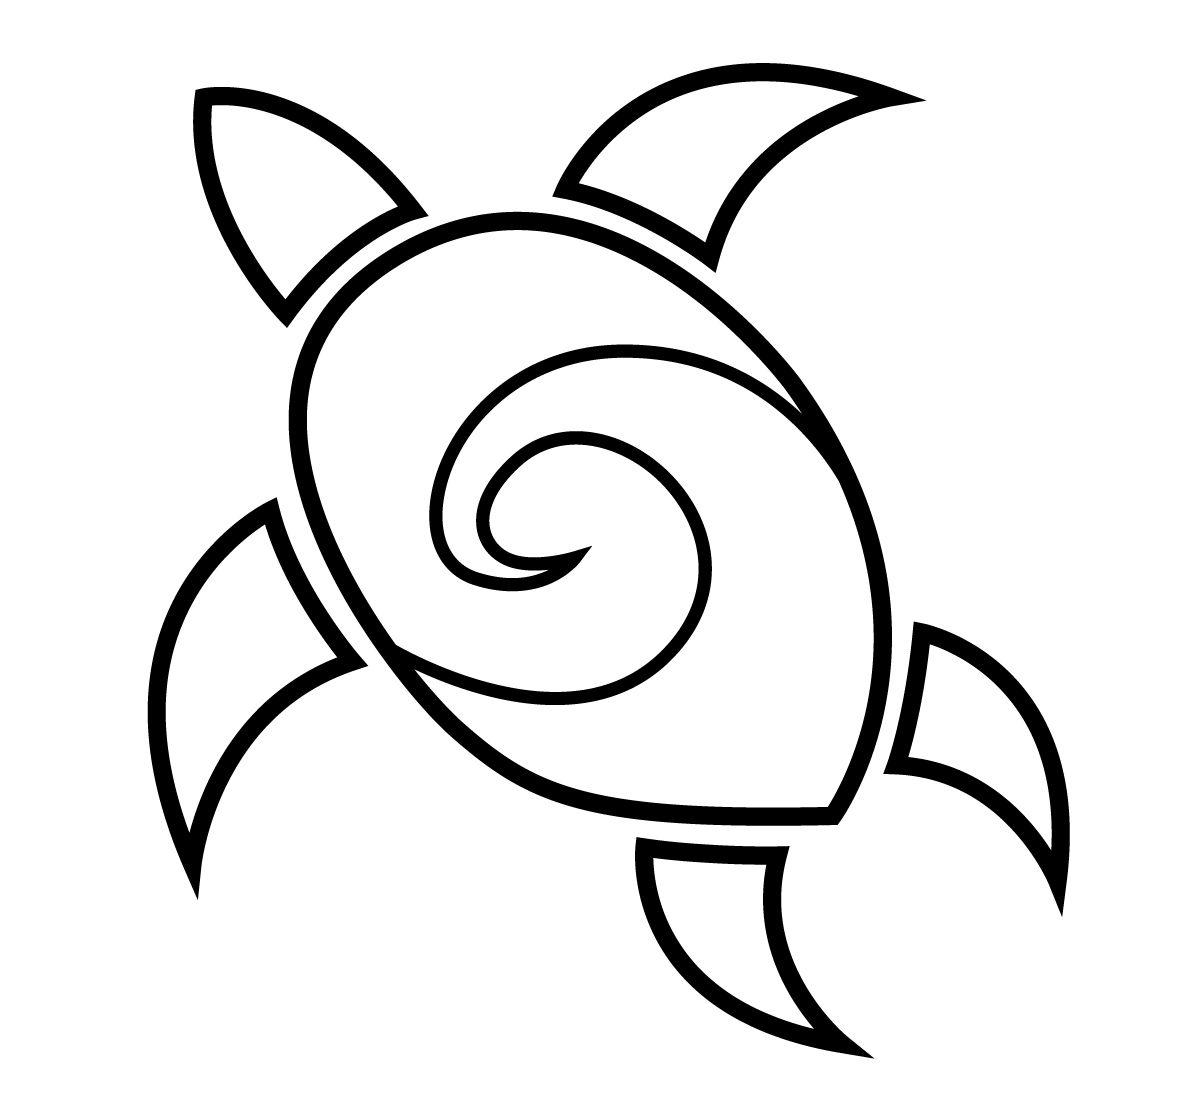 easy-tattoo-drawing-designs_172105.jpg (1188×1109) | Turtle ...